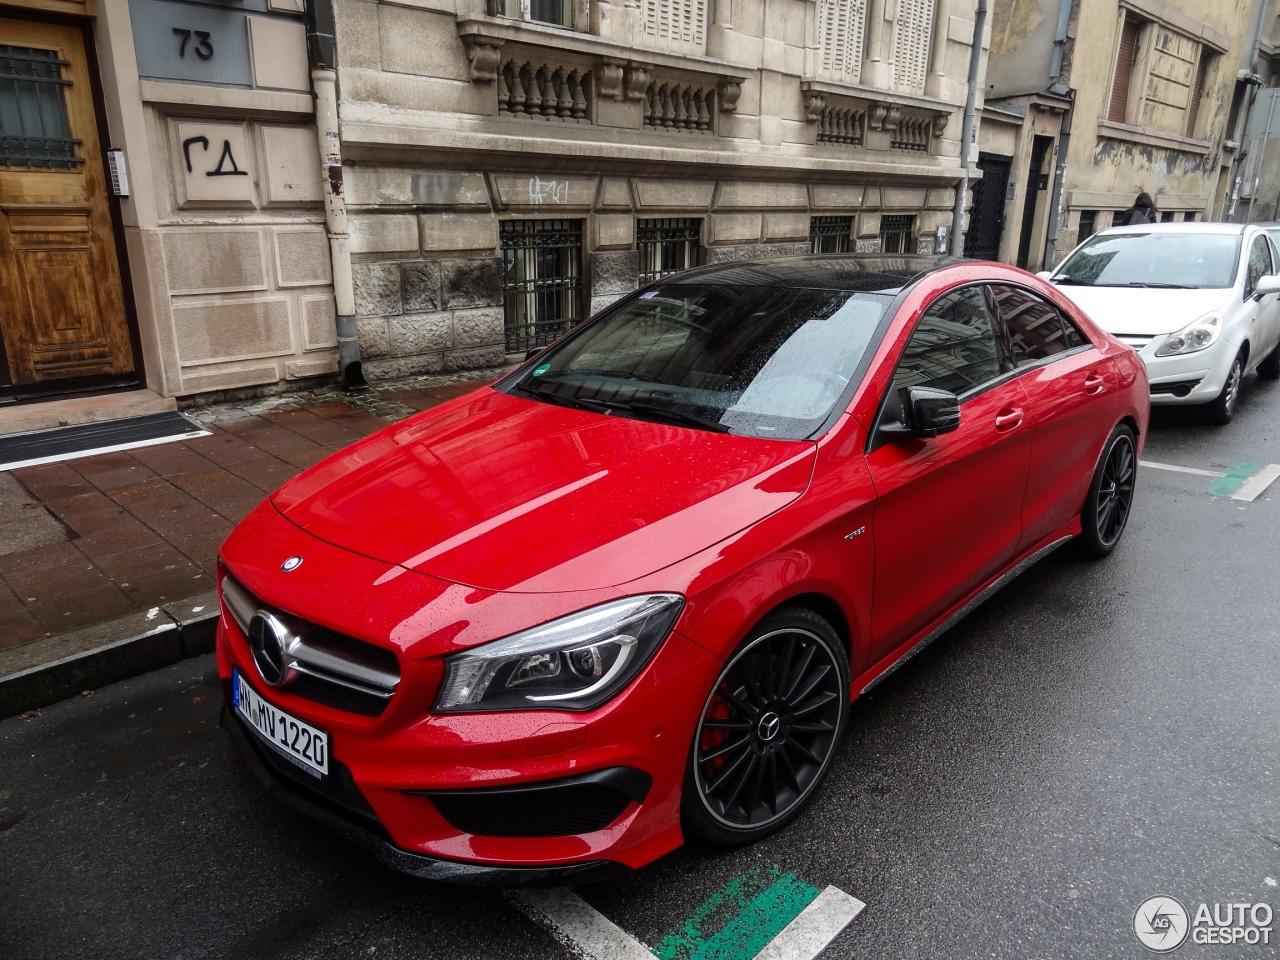 Mercedes benz cla 45 amg c117 19 january 2015 autogespot for 2015 mercedes benz cla class cla 45 amg